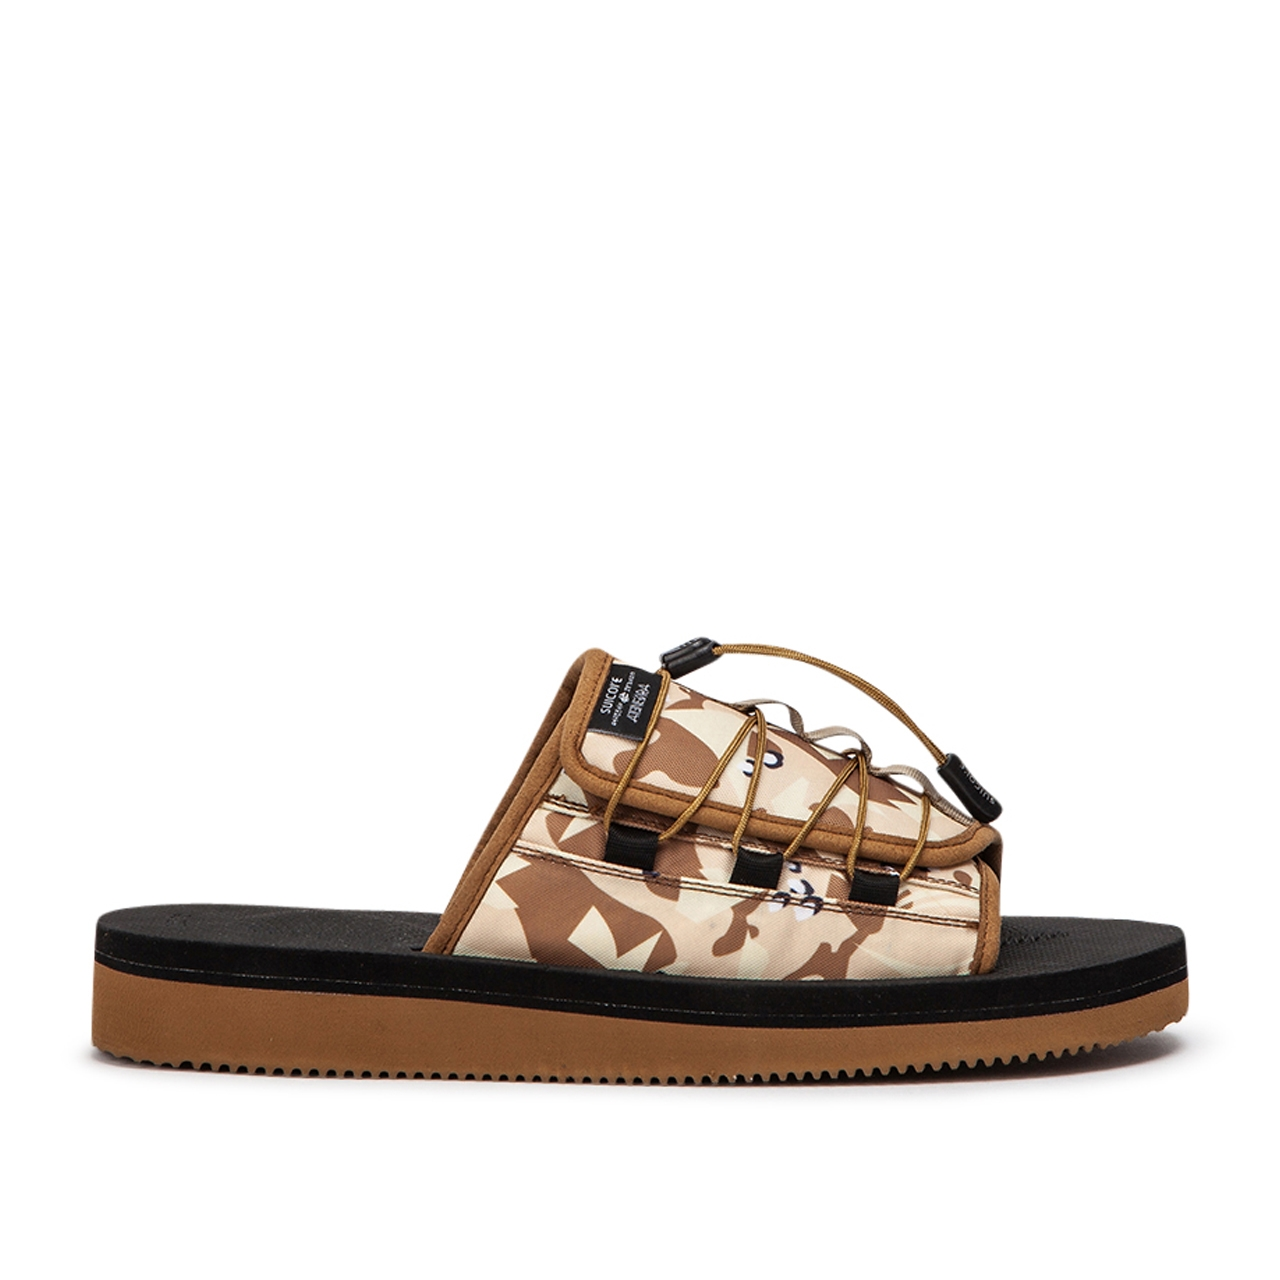 Suicoke Sandals x CLOT Juice OLAS CL-Tab (Beige) - OG-154CLTAB-OLAS-002